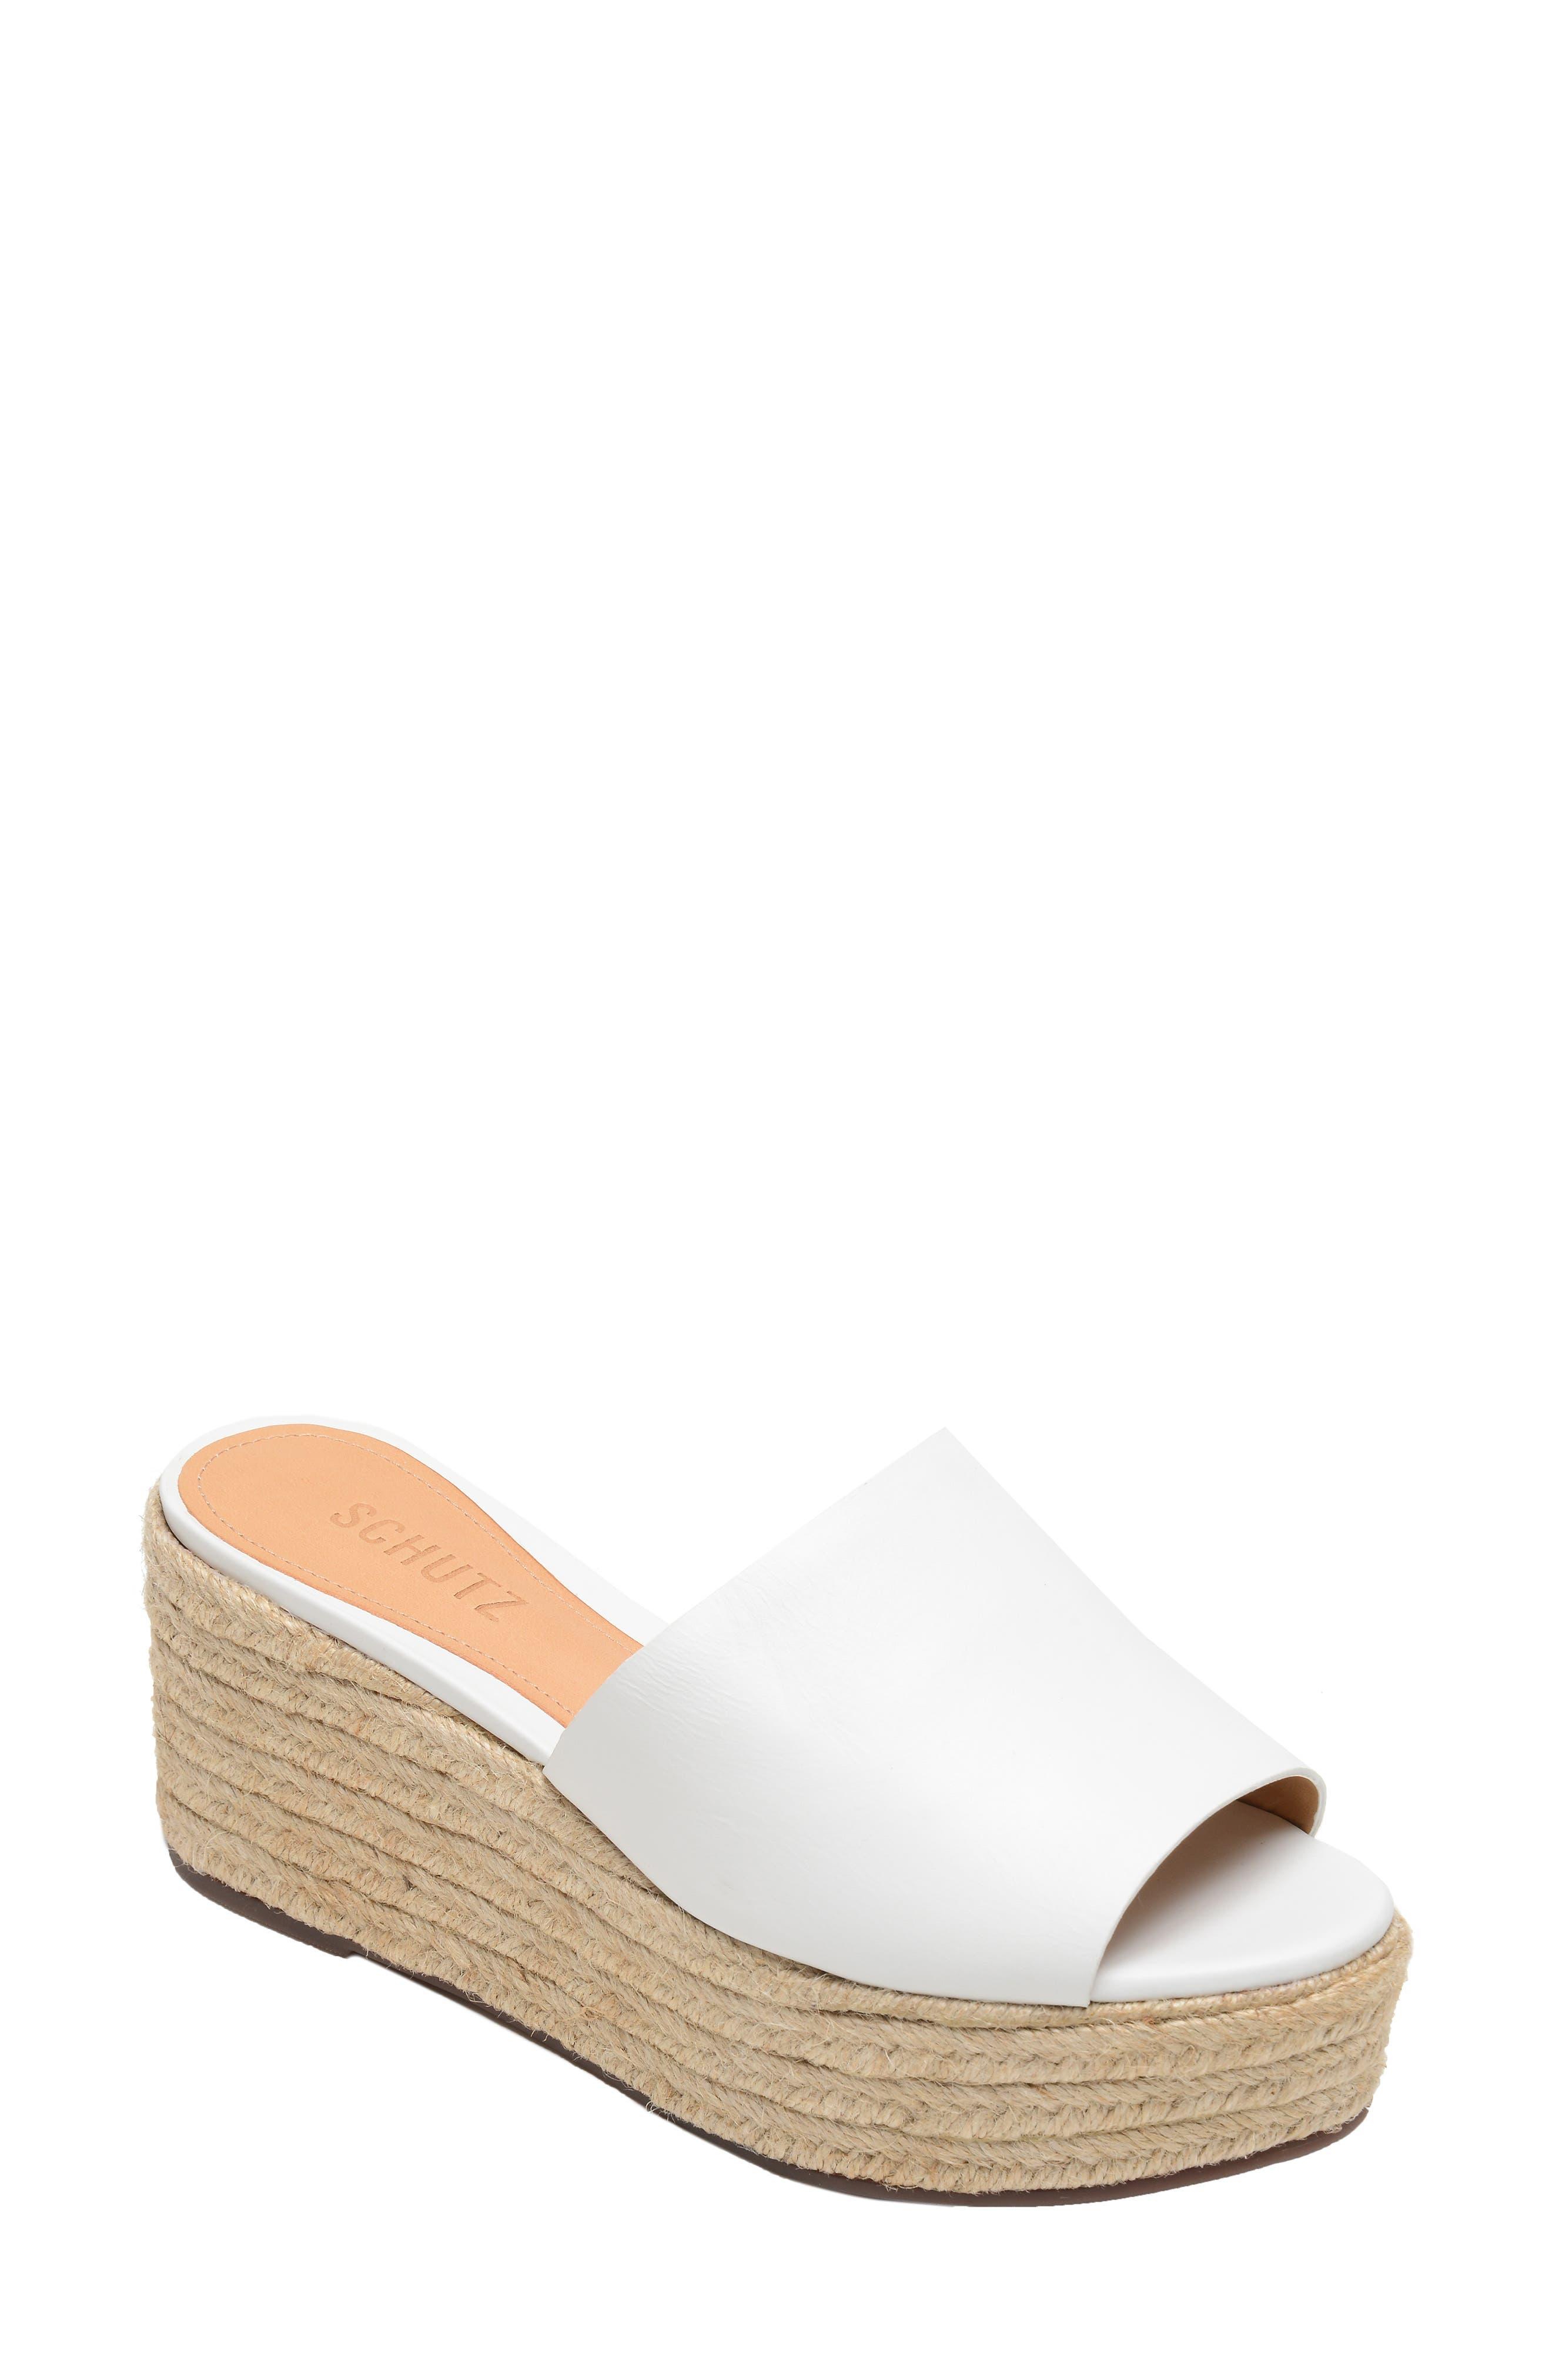 SCHUTZ, Thalia Platform Wedge Slide Sandal, Main thumbnail 1, color, WHITE